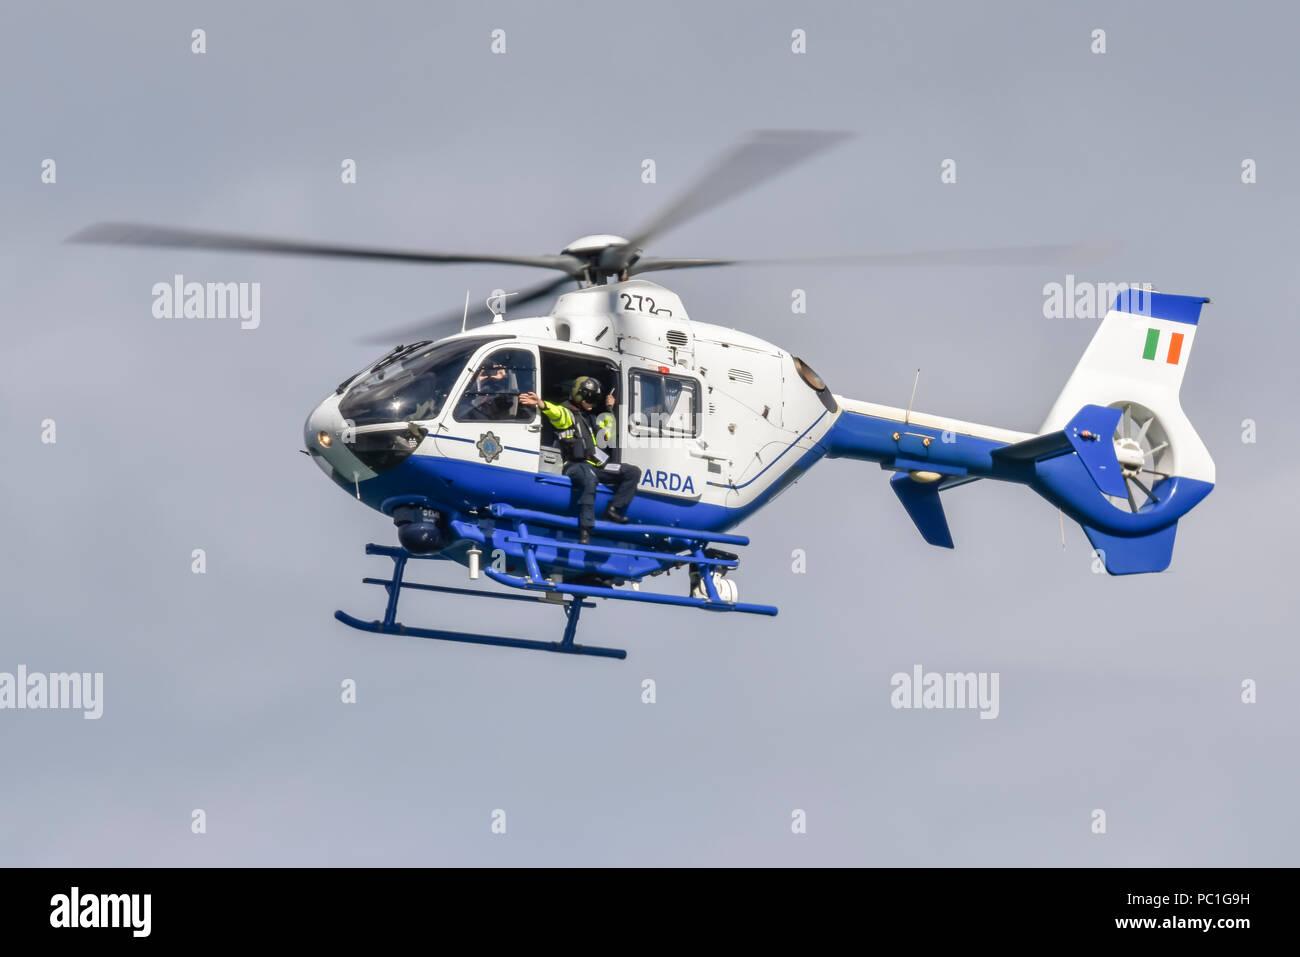 Eurocopter EC-135 helicopter belonging to the Irish Garda Siochana police force. - Stock Image